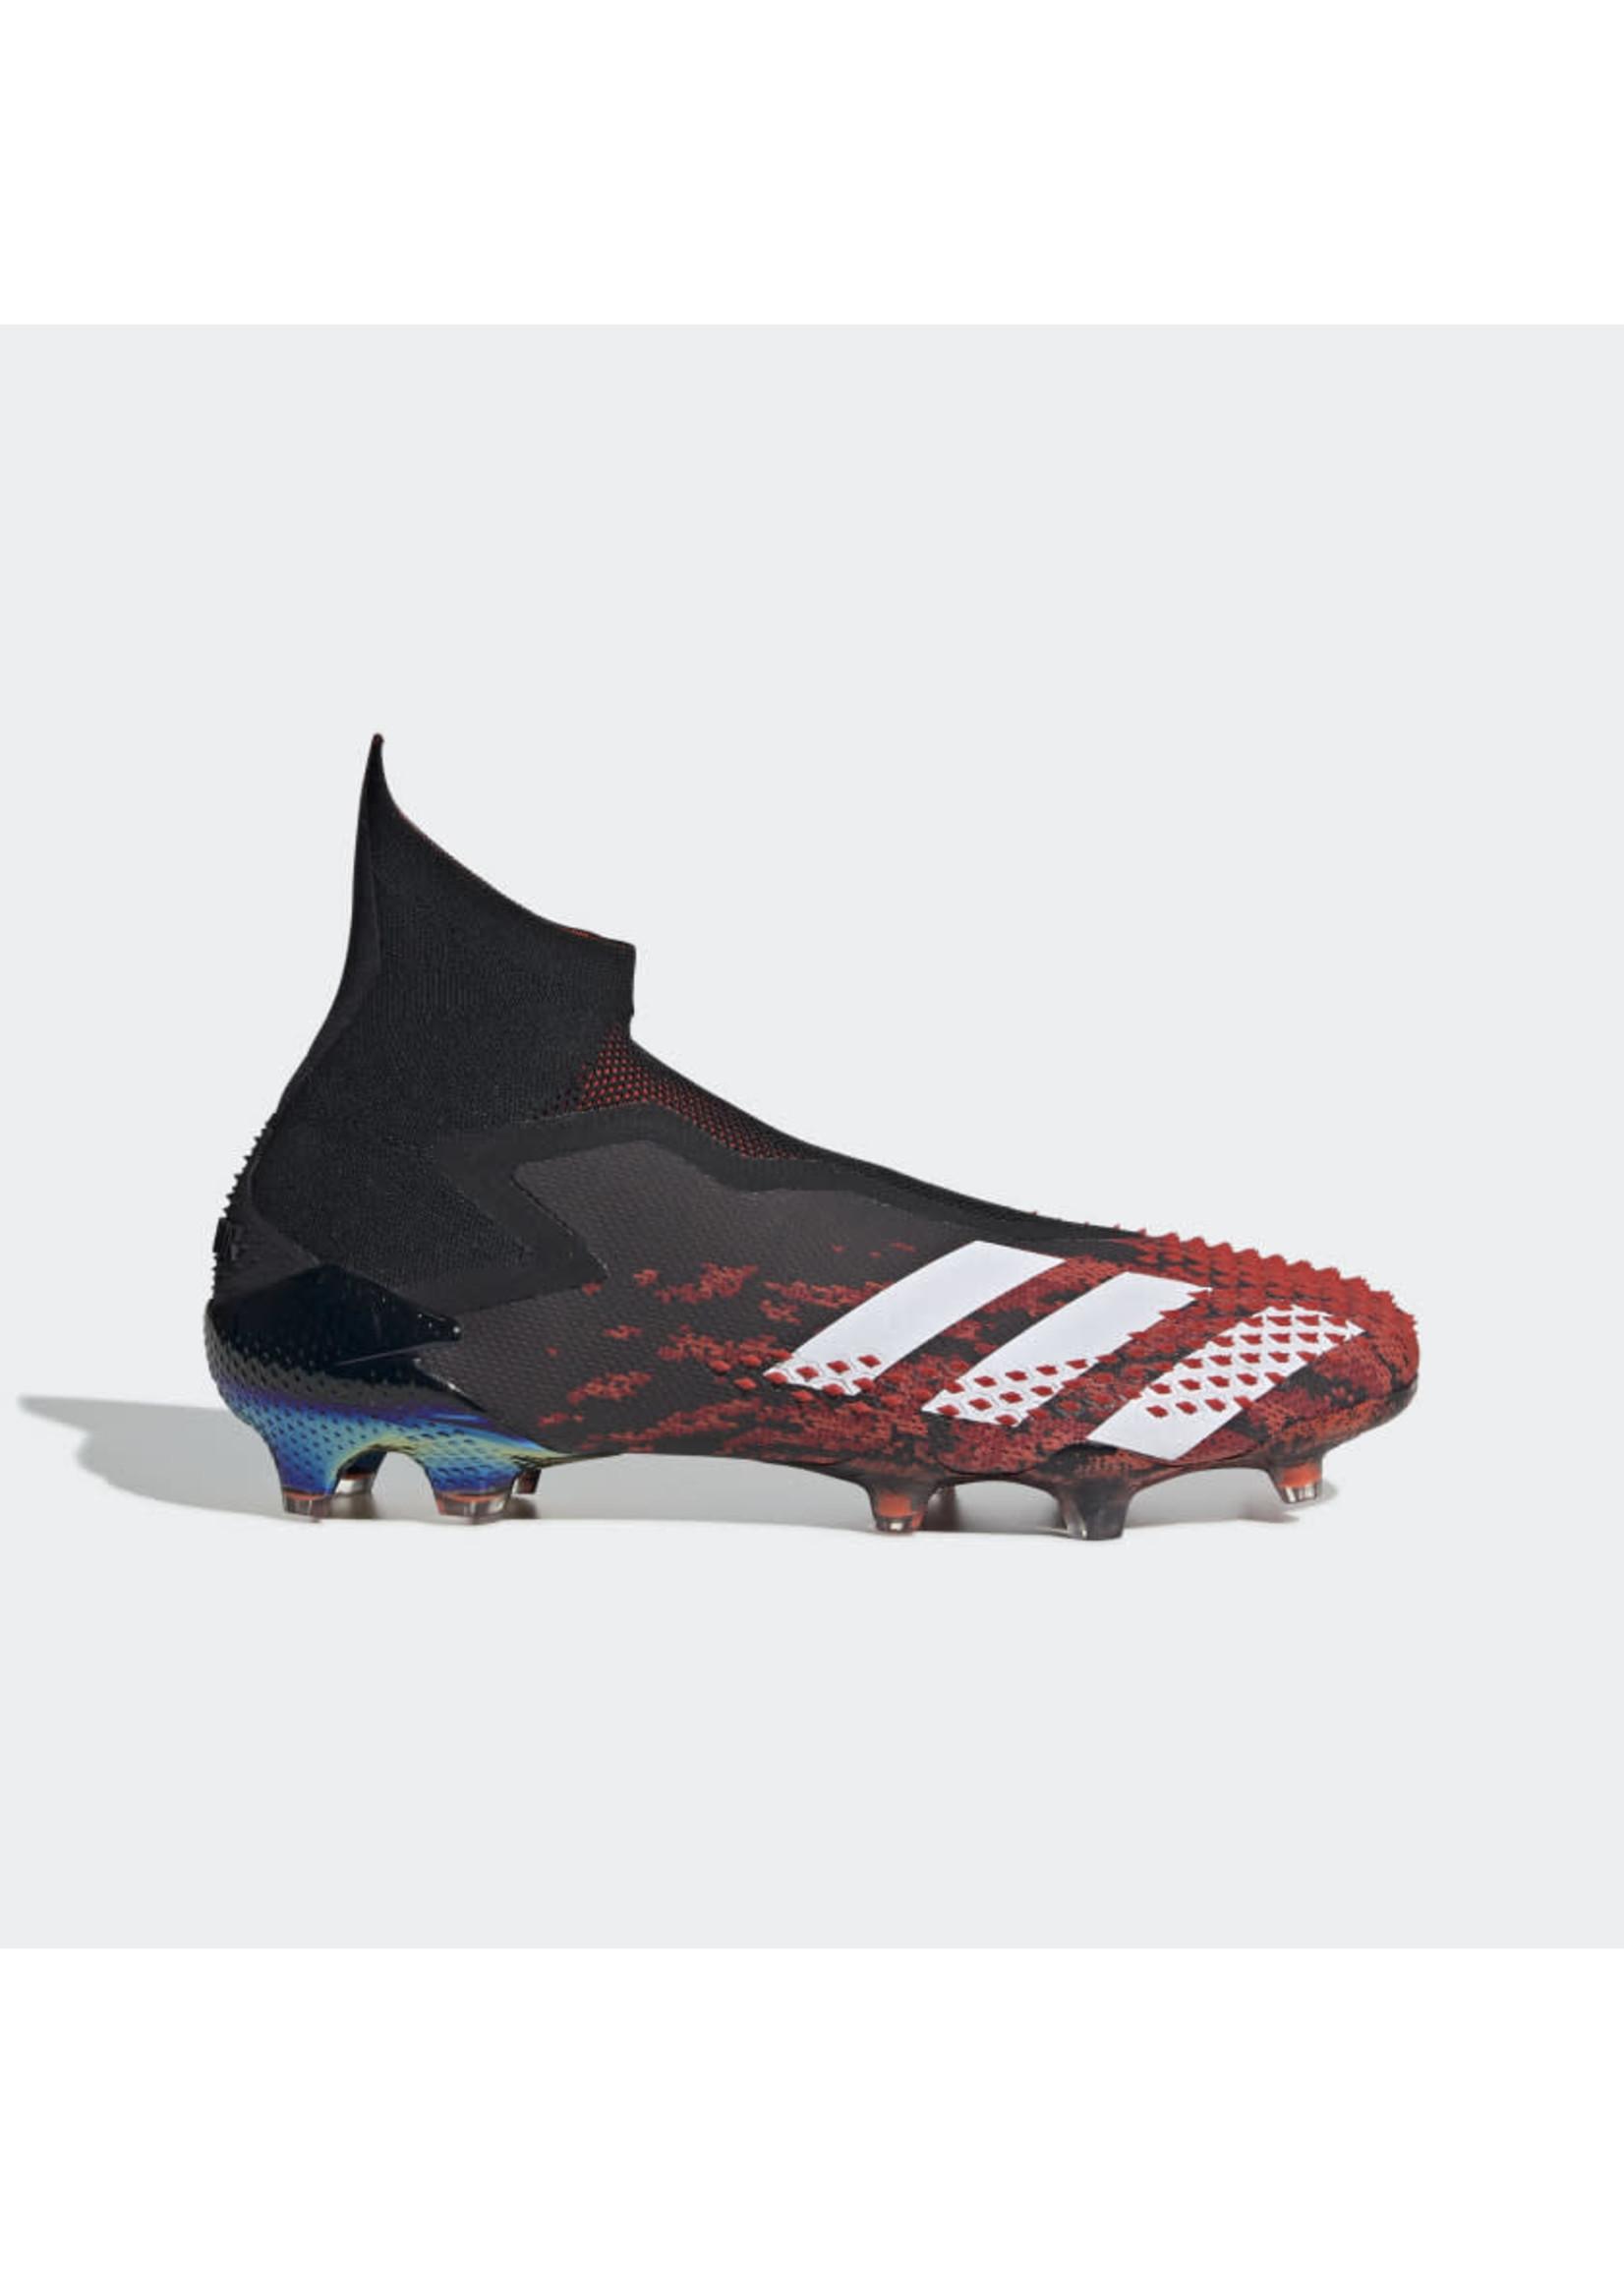 Adidas Predator Mutator 20+ FG - Black/Red